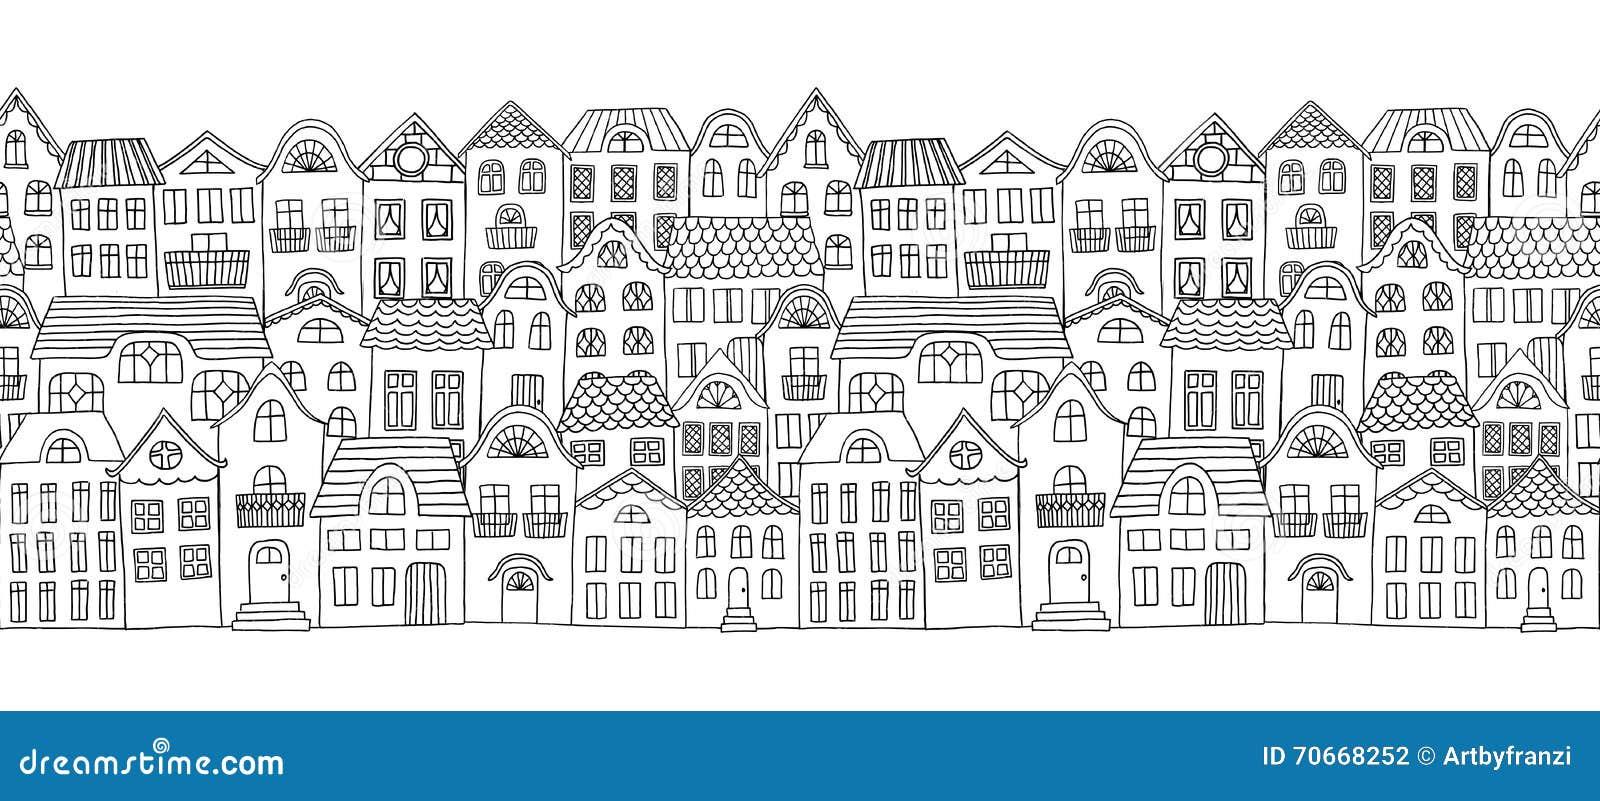 Bandera horizontal inconsútil con las pequeñas casas lindas